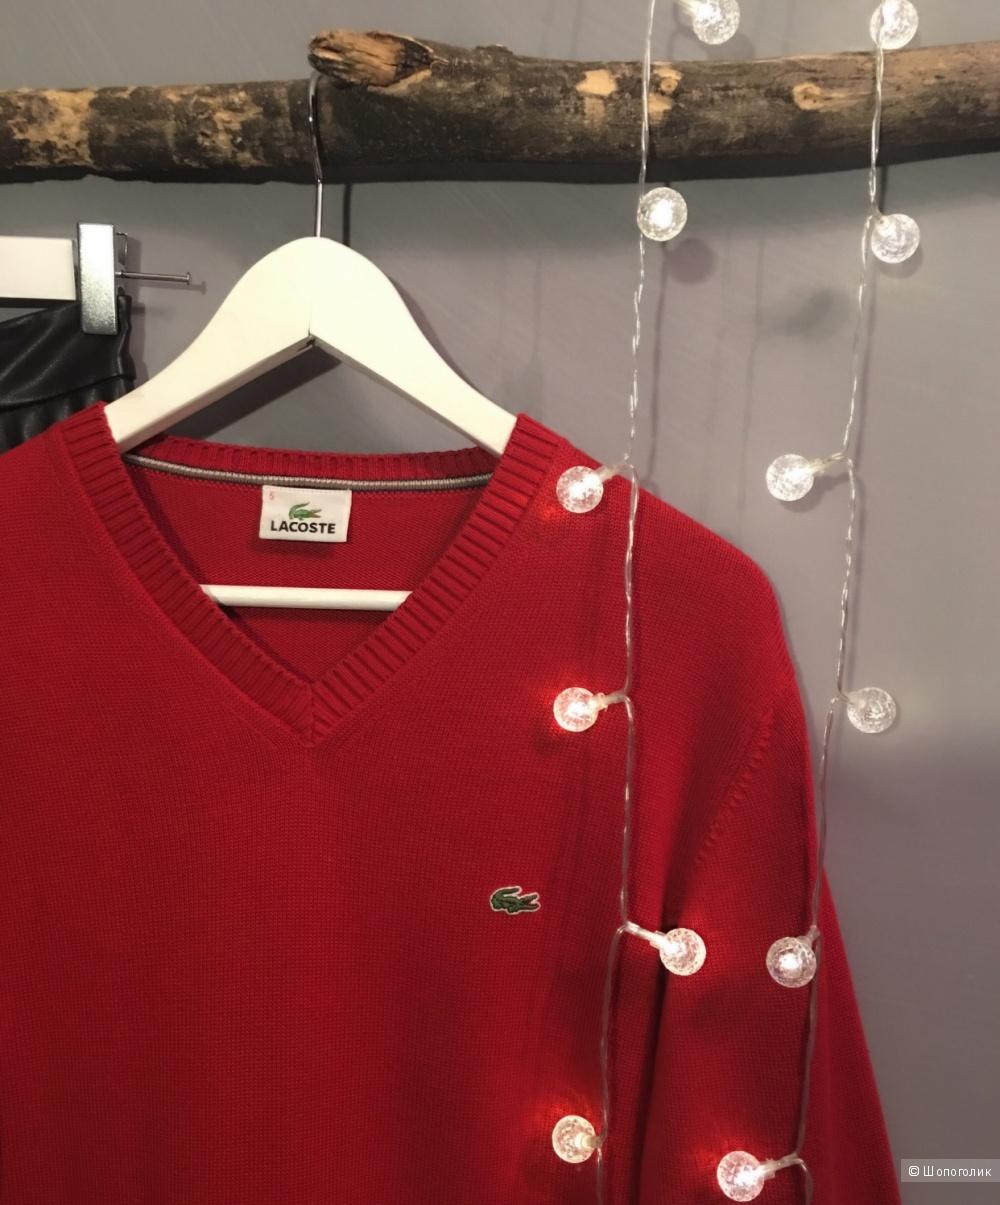 Пуловер Lacoste. Размер L.